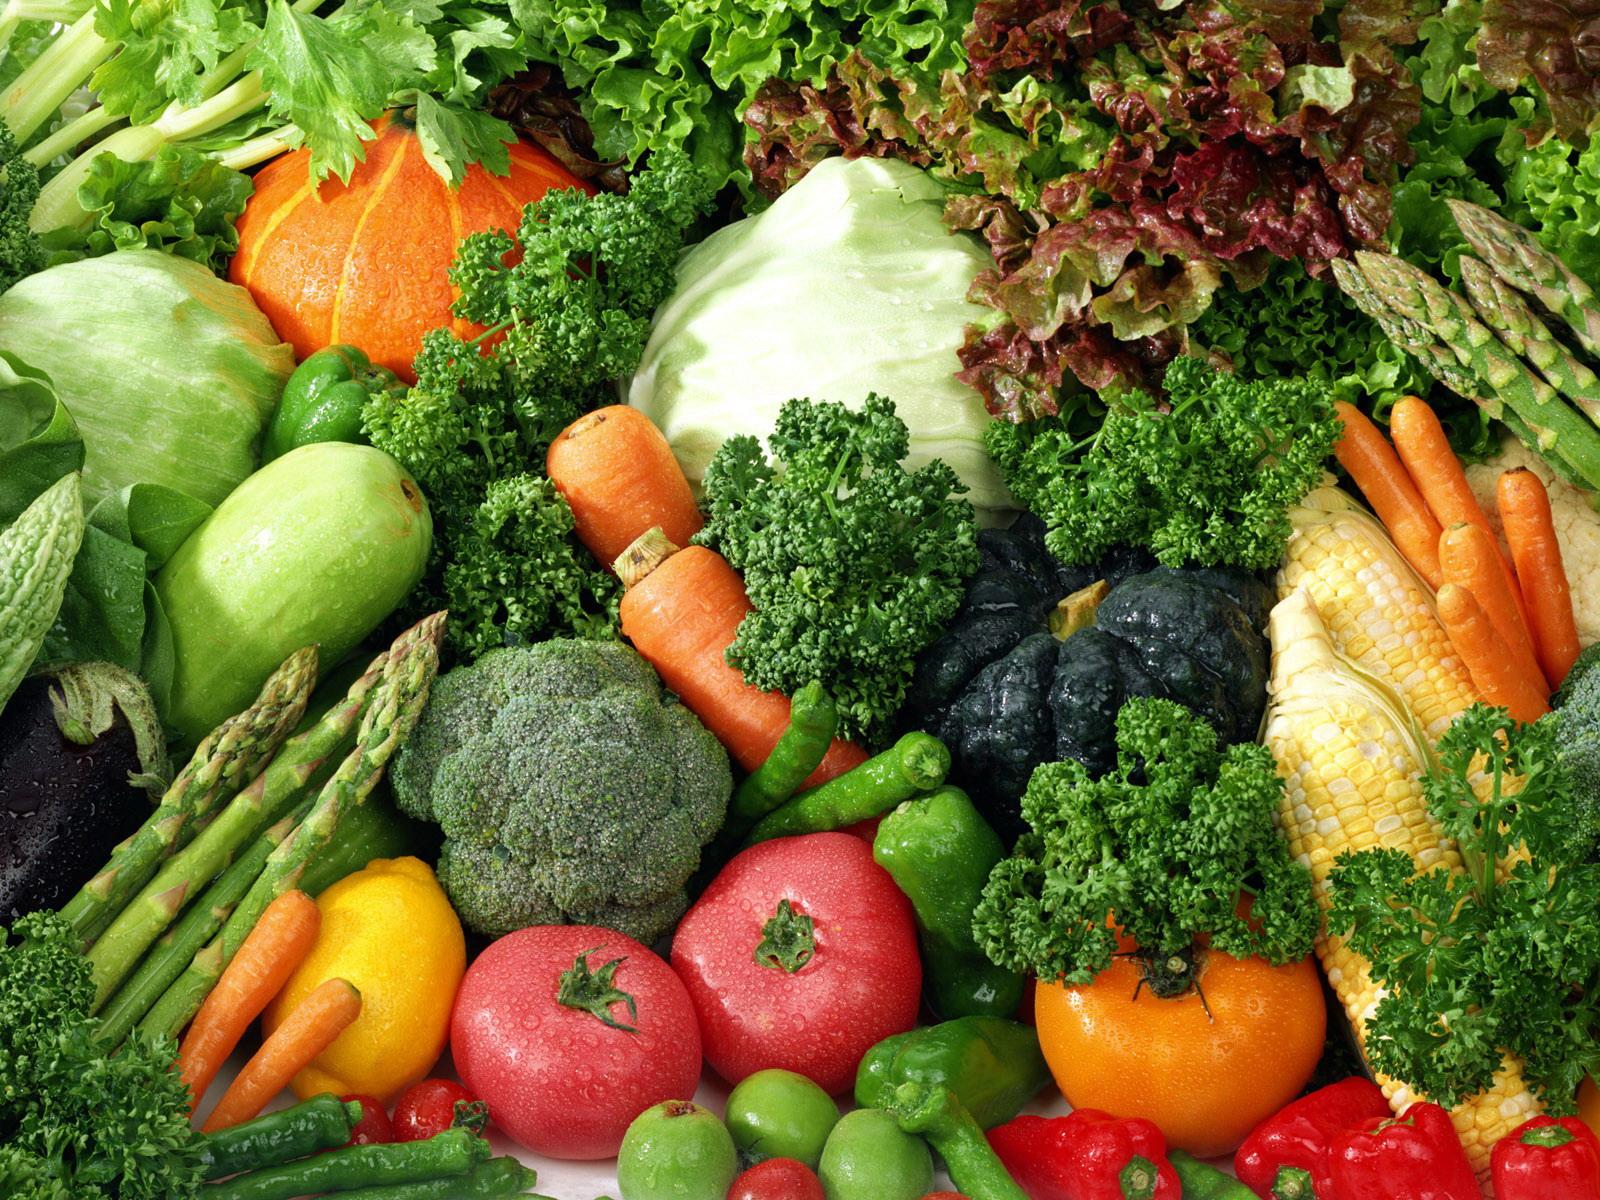 Hd wallpapers vegetables